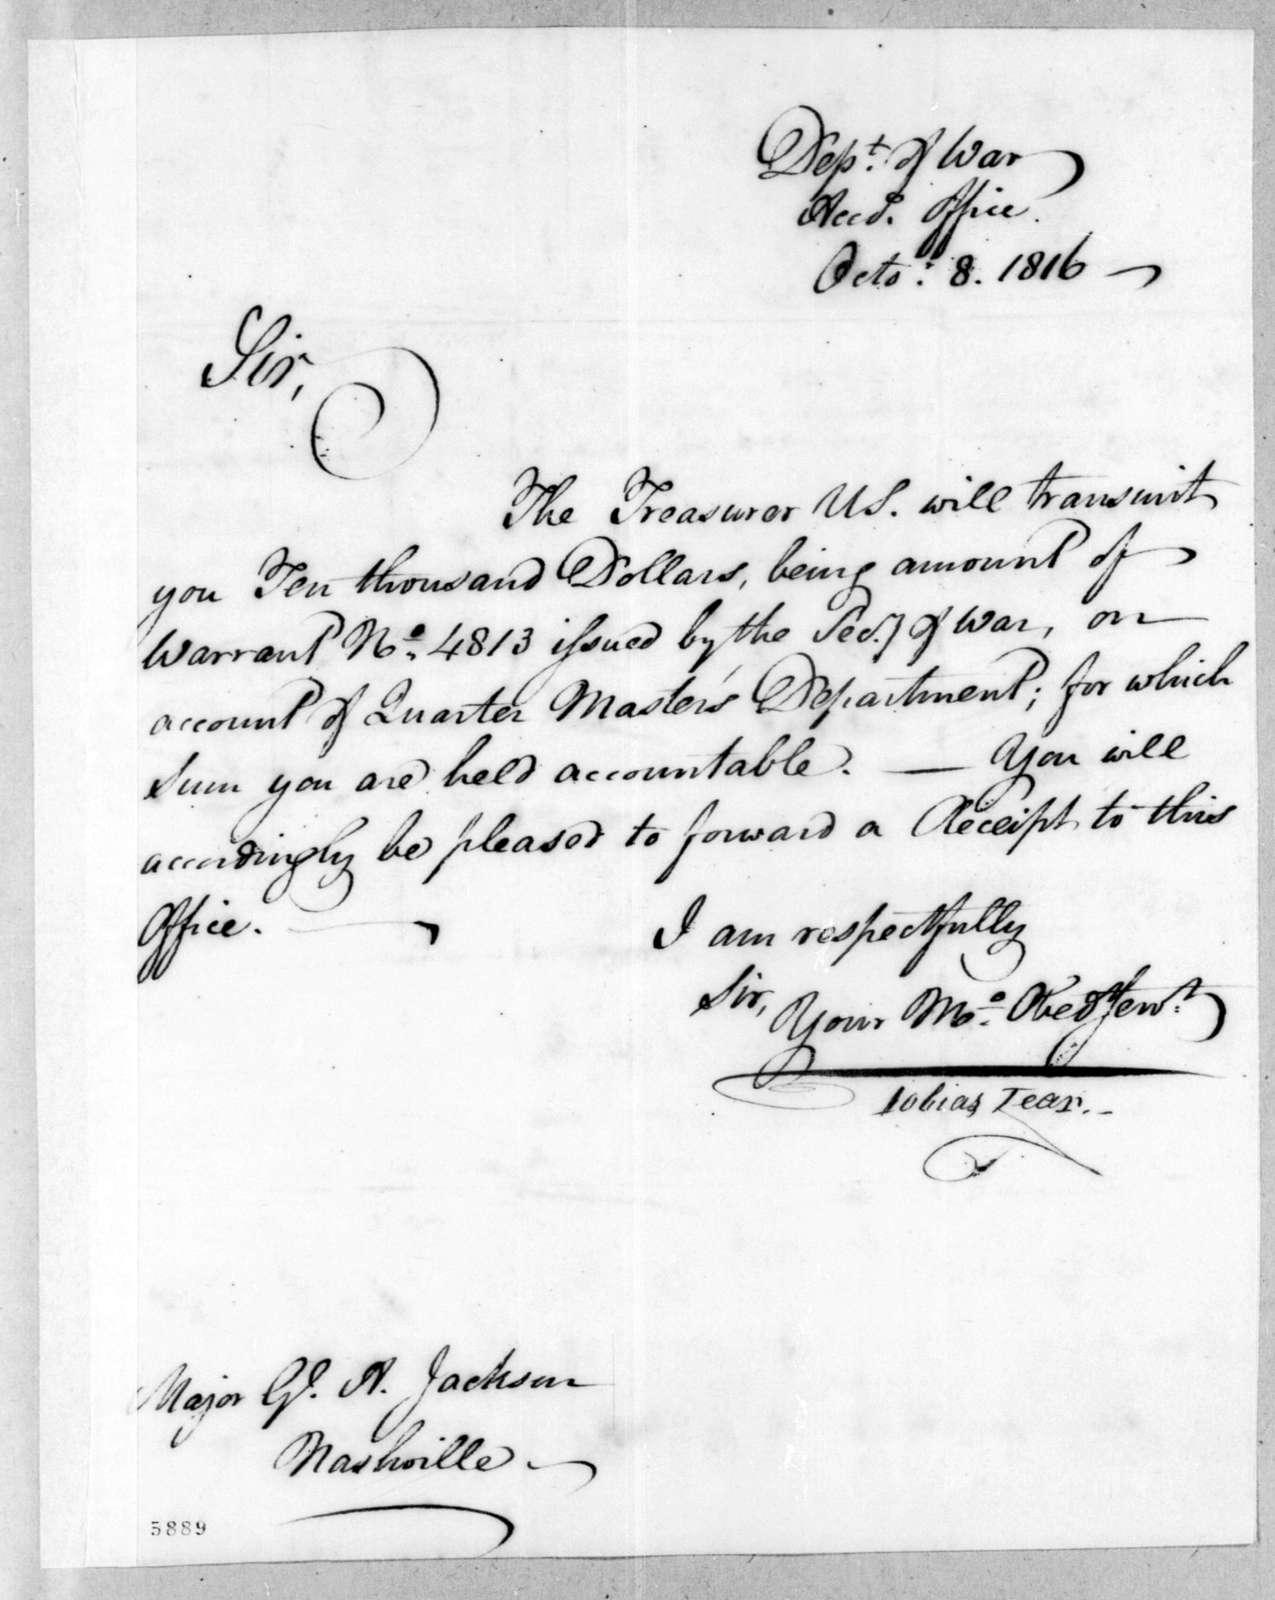 Tobias Lear to Andrew Jackson, October 8, 1816